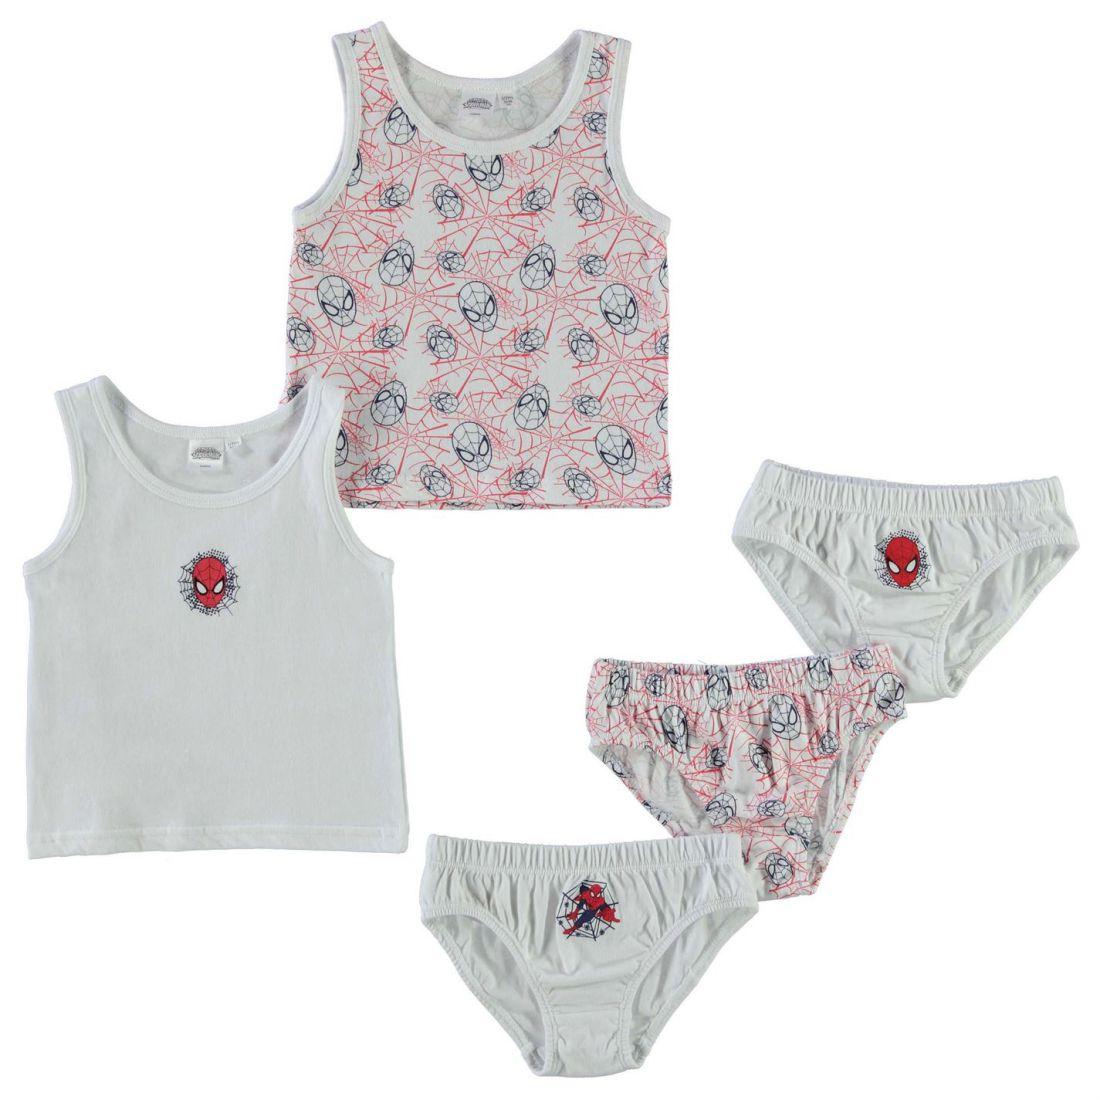 7b13135d7 Kids Briefs Underwear Character 5 Pack Vest and Brief Set Infant ...